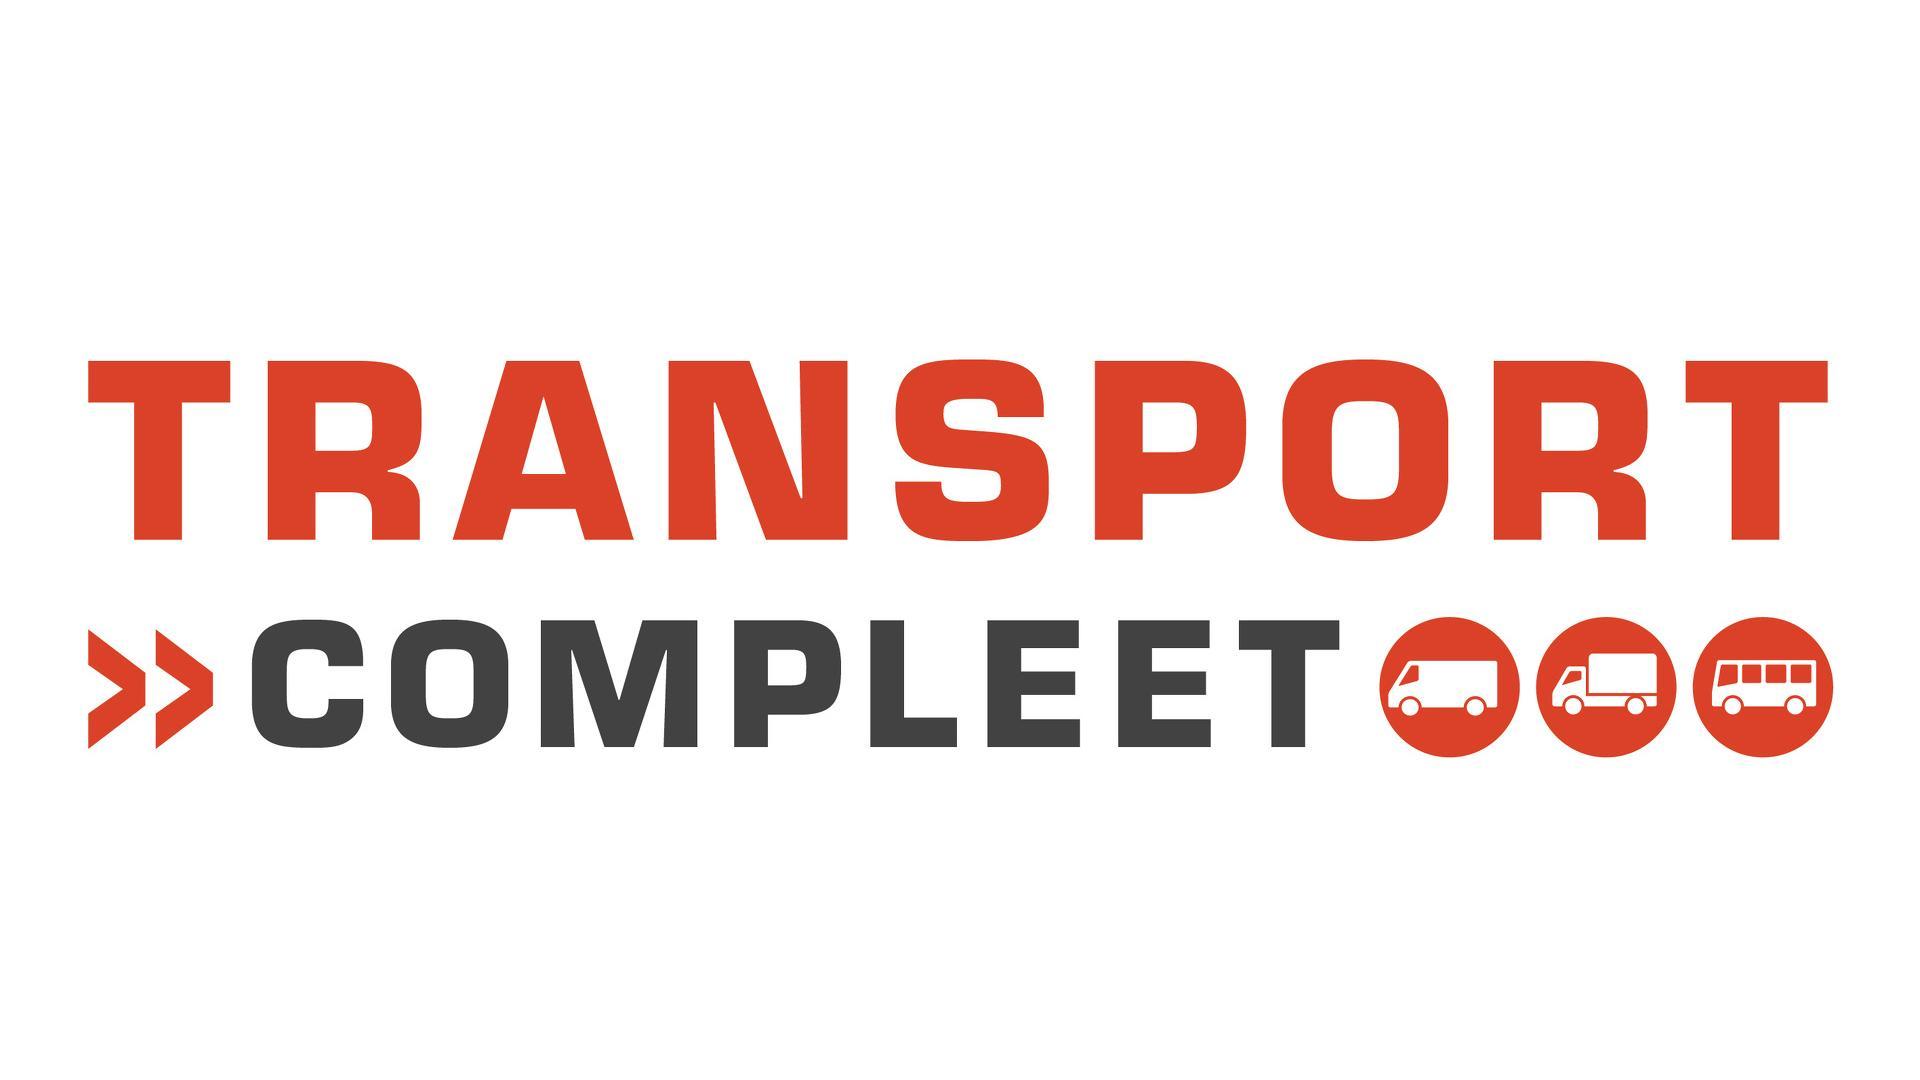 Transport Compleet Gorinchem